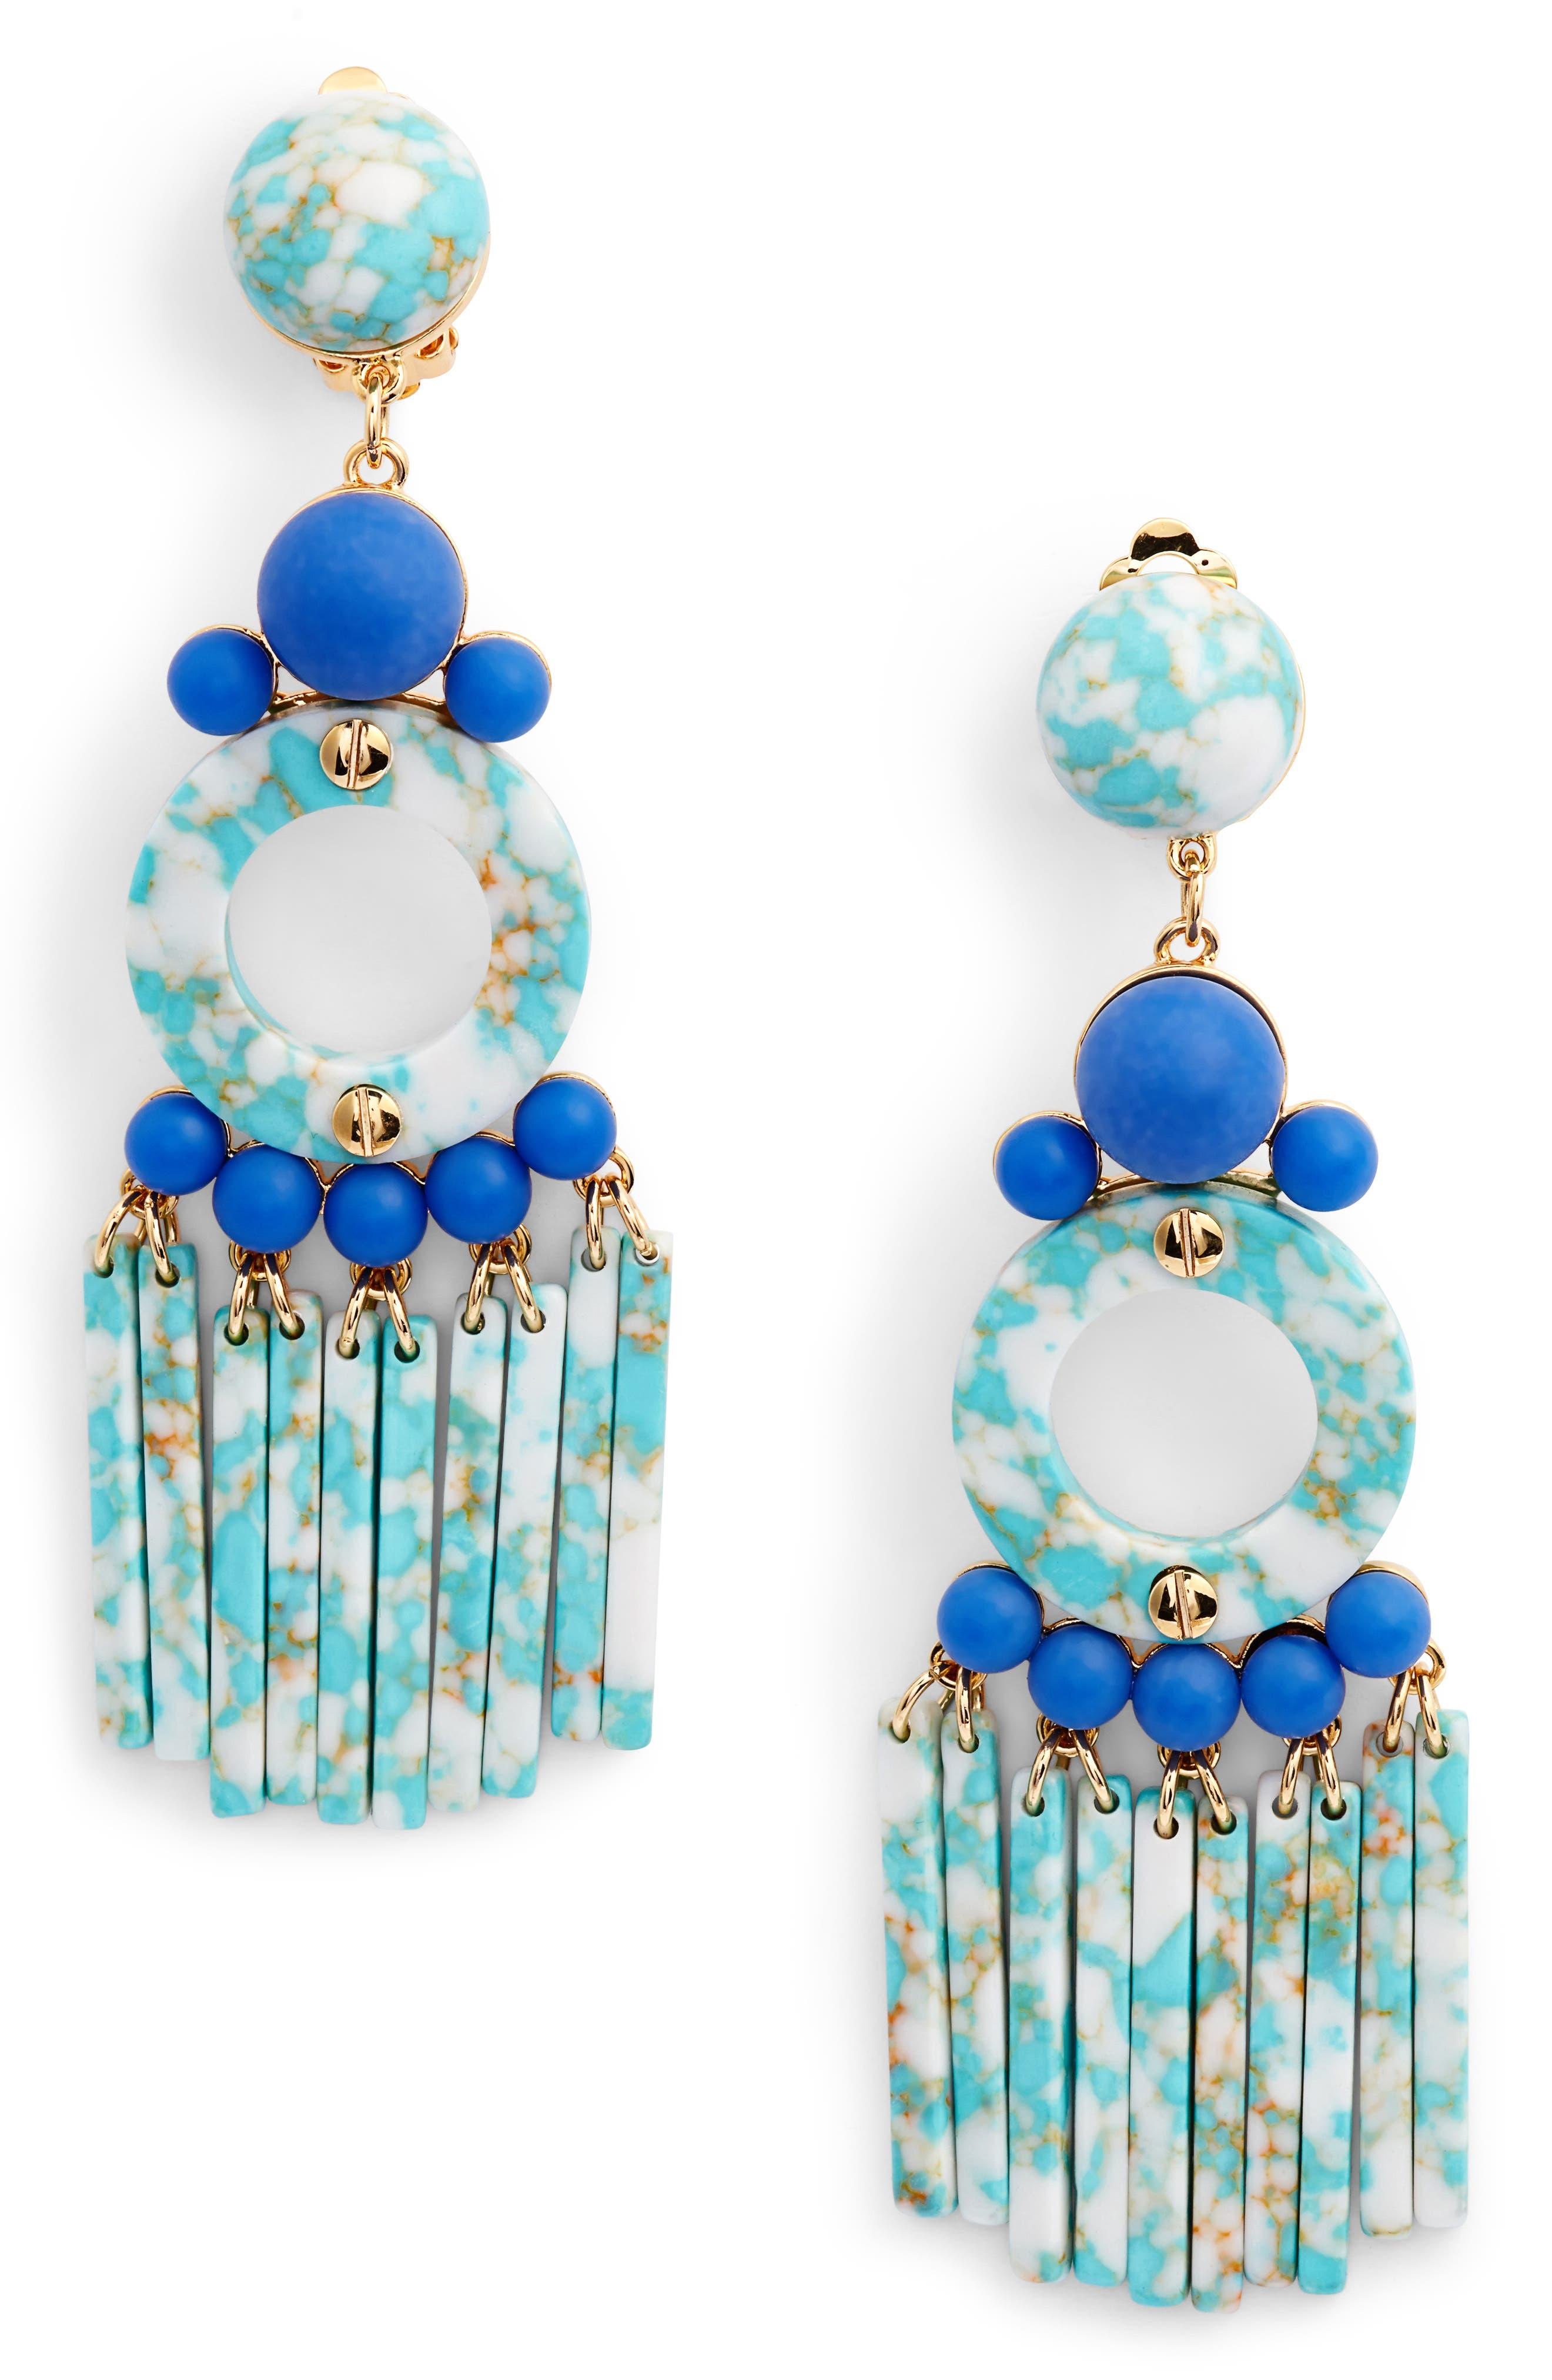 Samba Beaded Drop Earrings,                             Main thumbnail 1, color,                             Turquoise